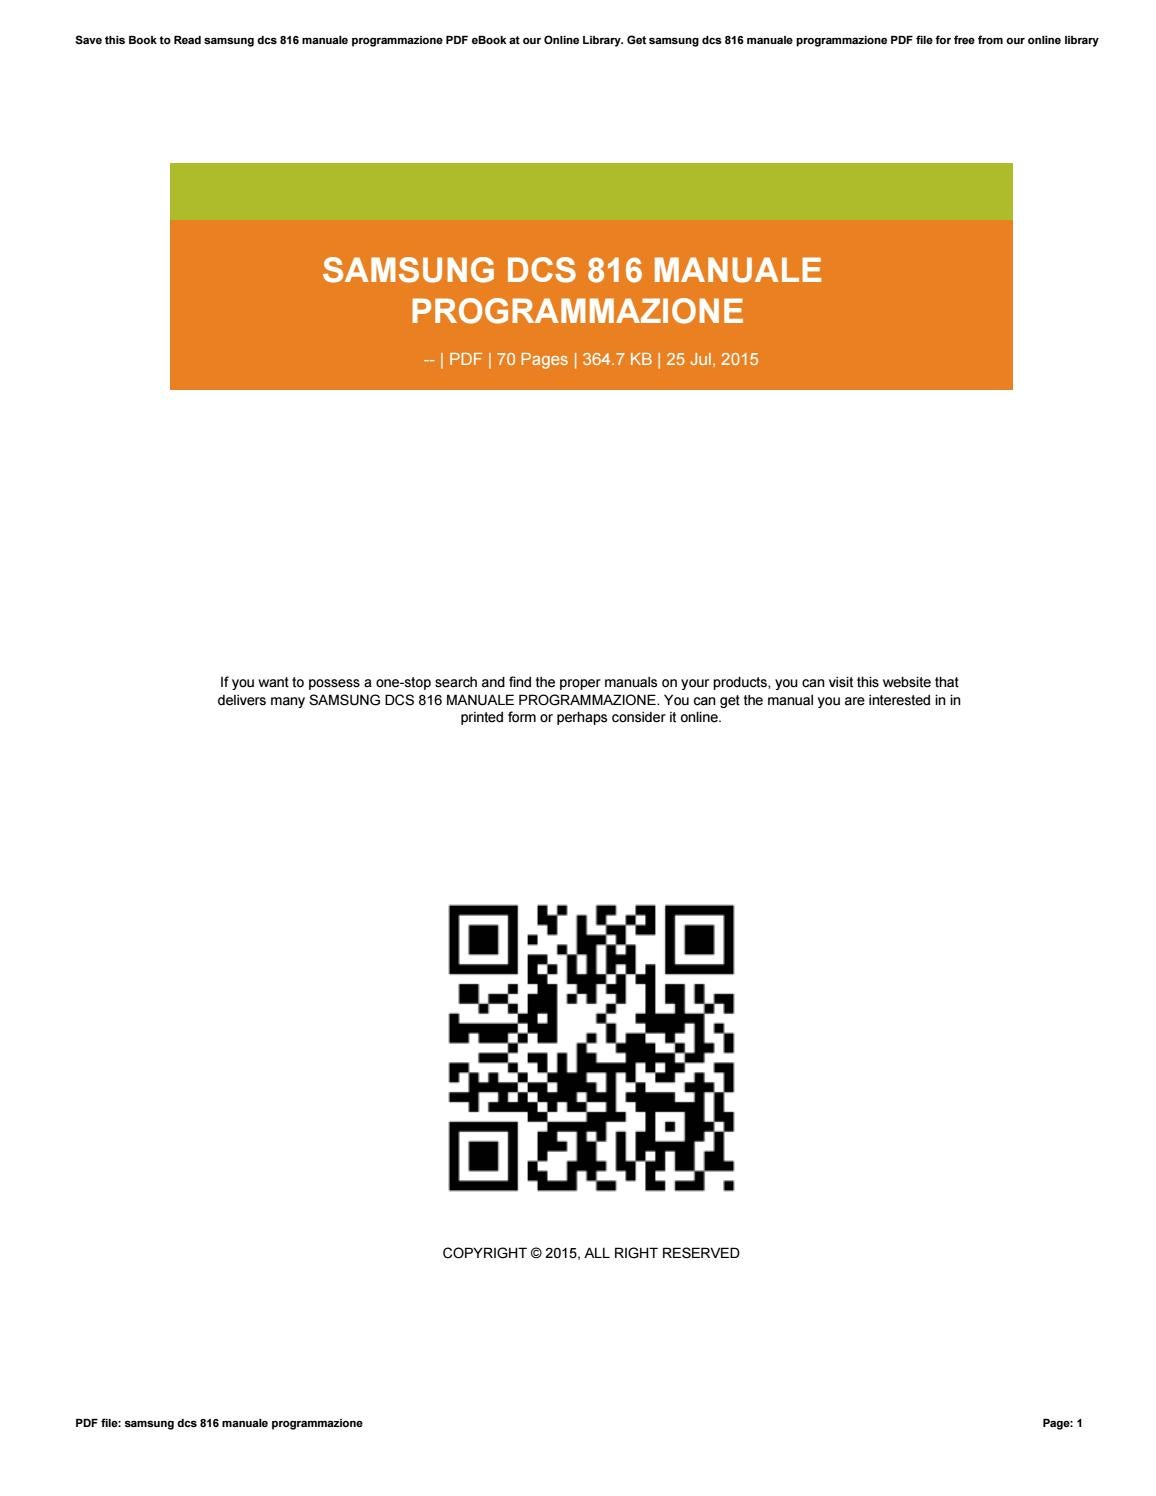 samsung dcs 816 manuale programmazione by preseven6 issuu rh issuu com Samsung User Manual Guide Samsung Galaxy S3 User Guide